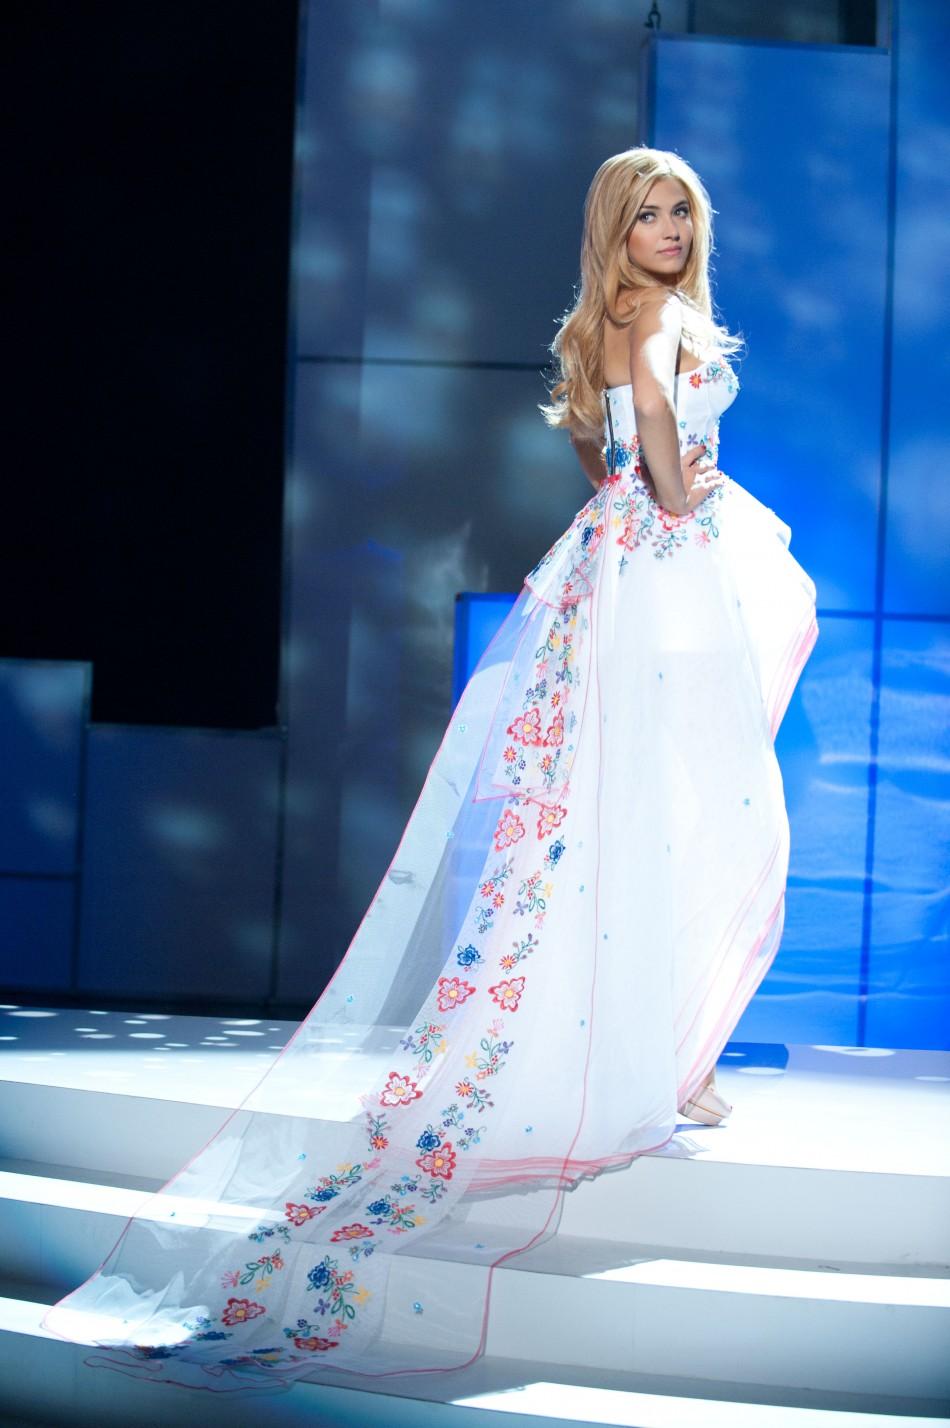 Miss Poland 2011